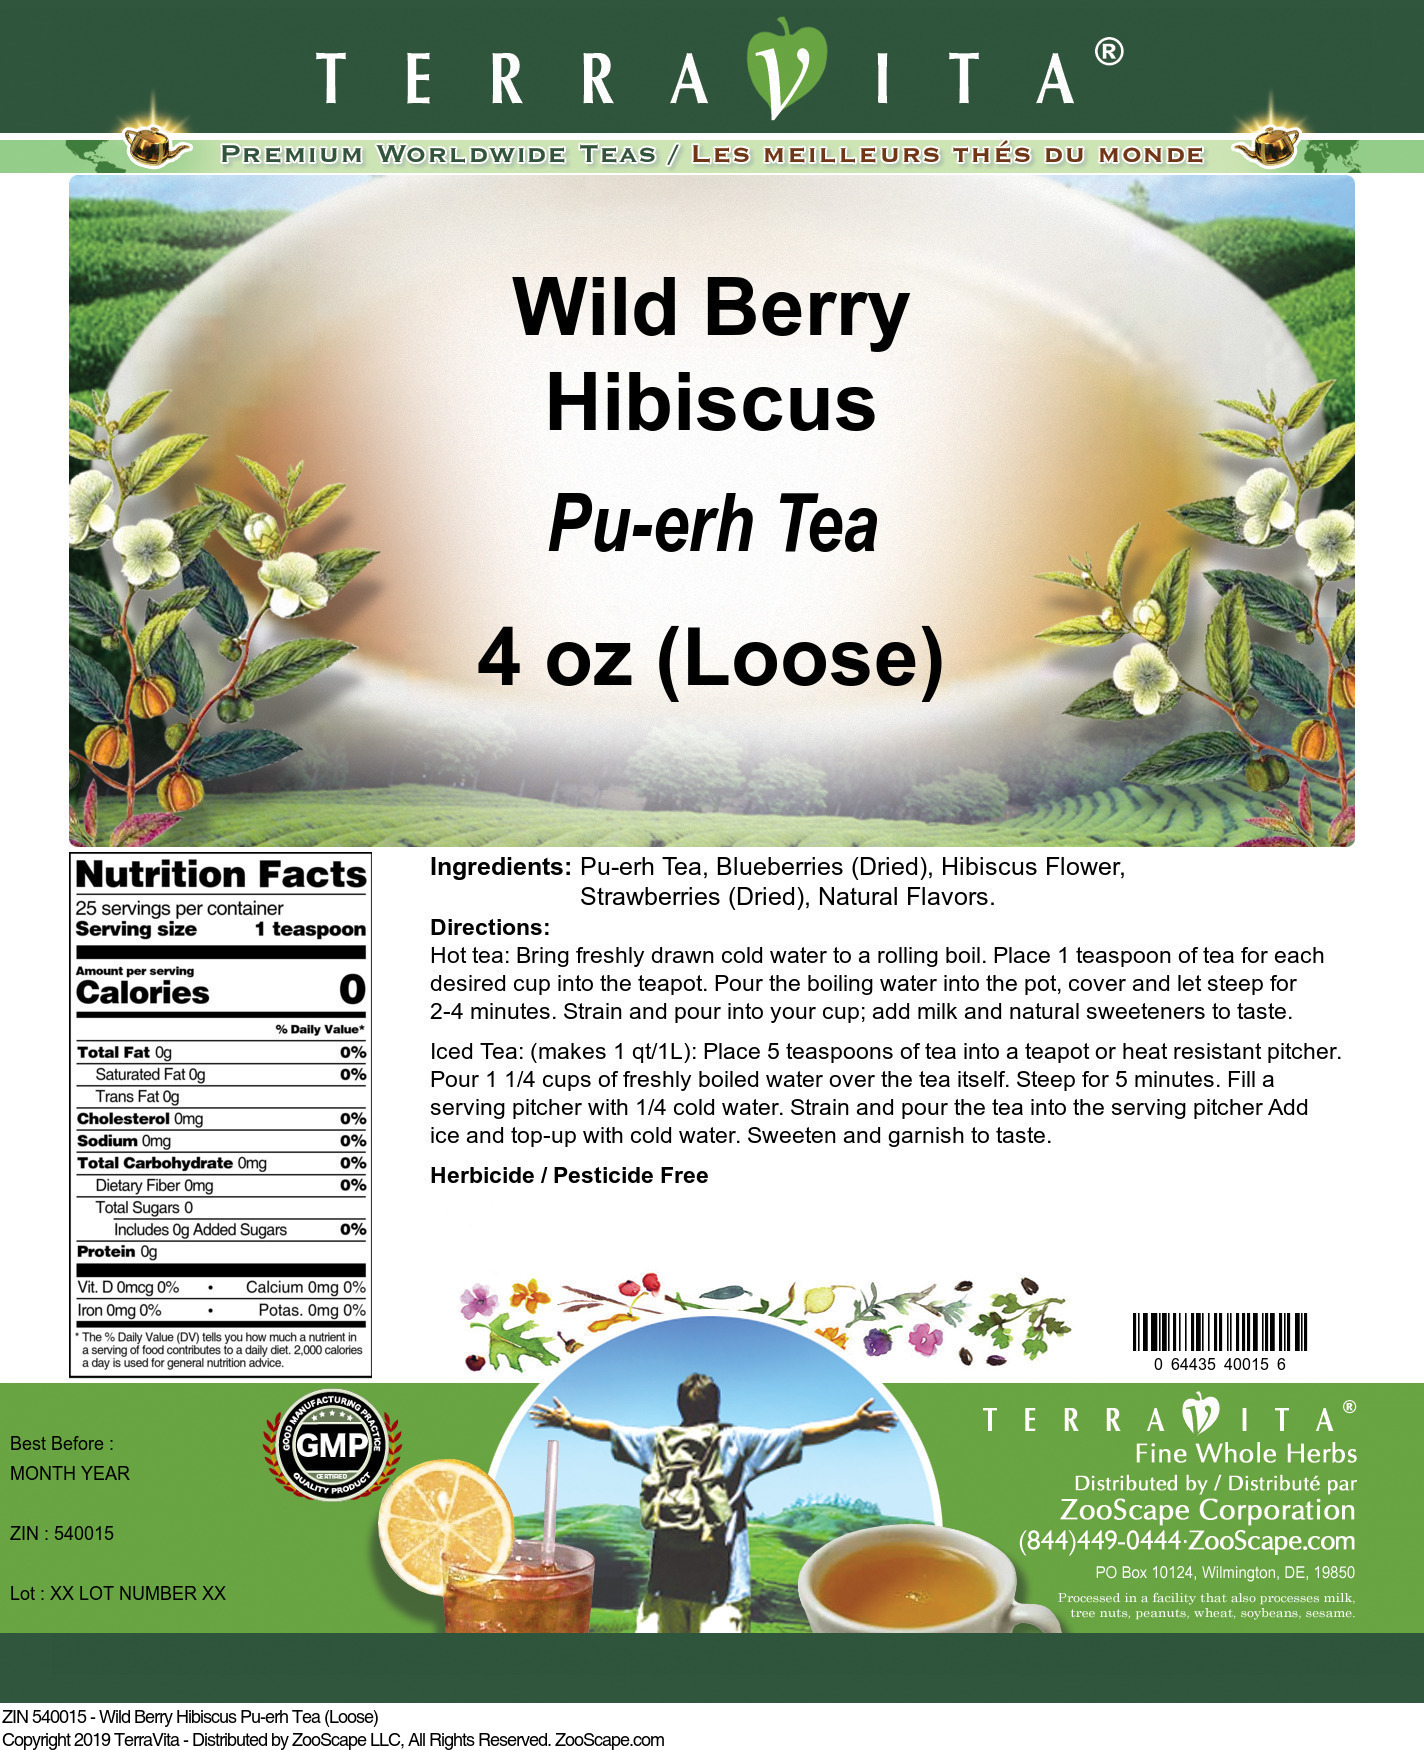 Wild Berry Hibiscus Pu-erh Tea